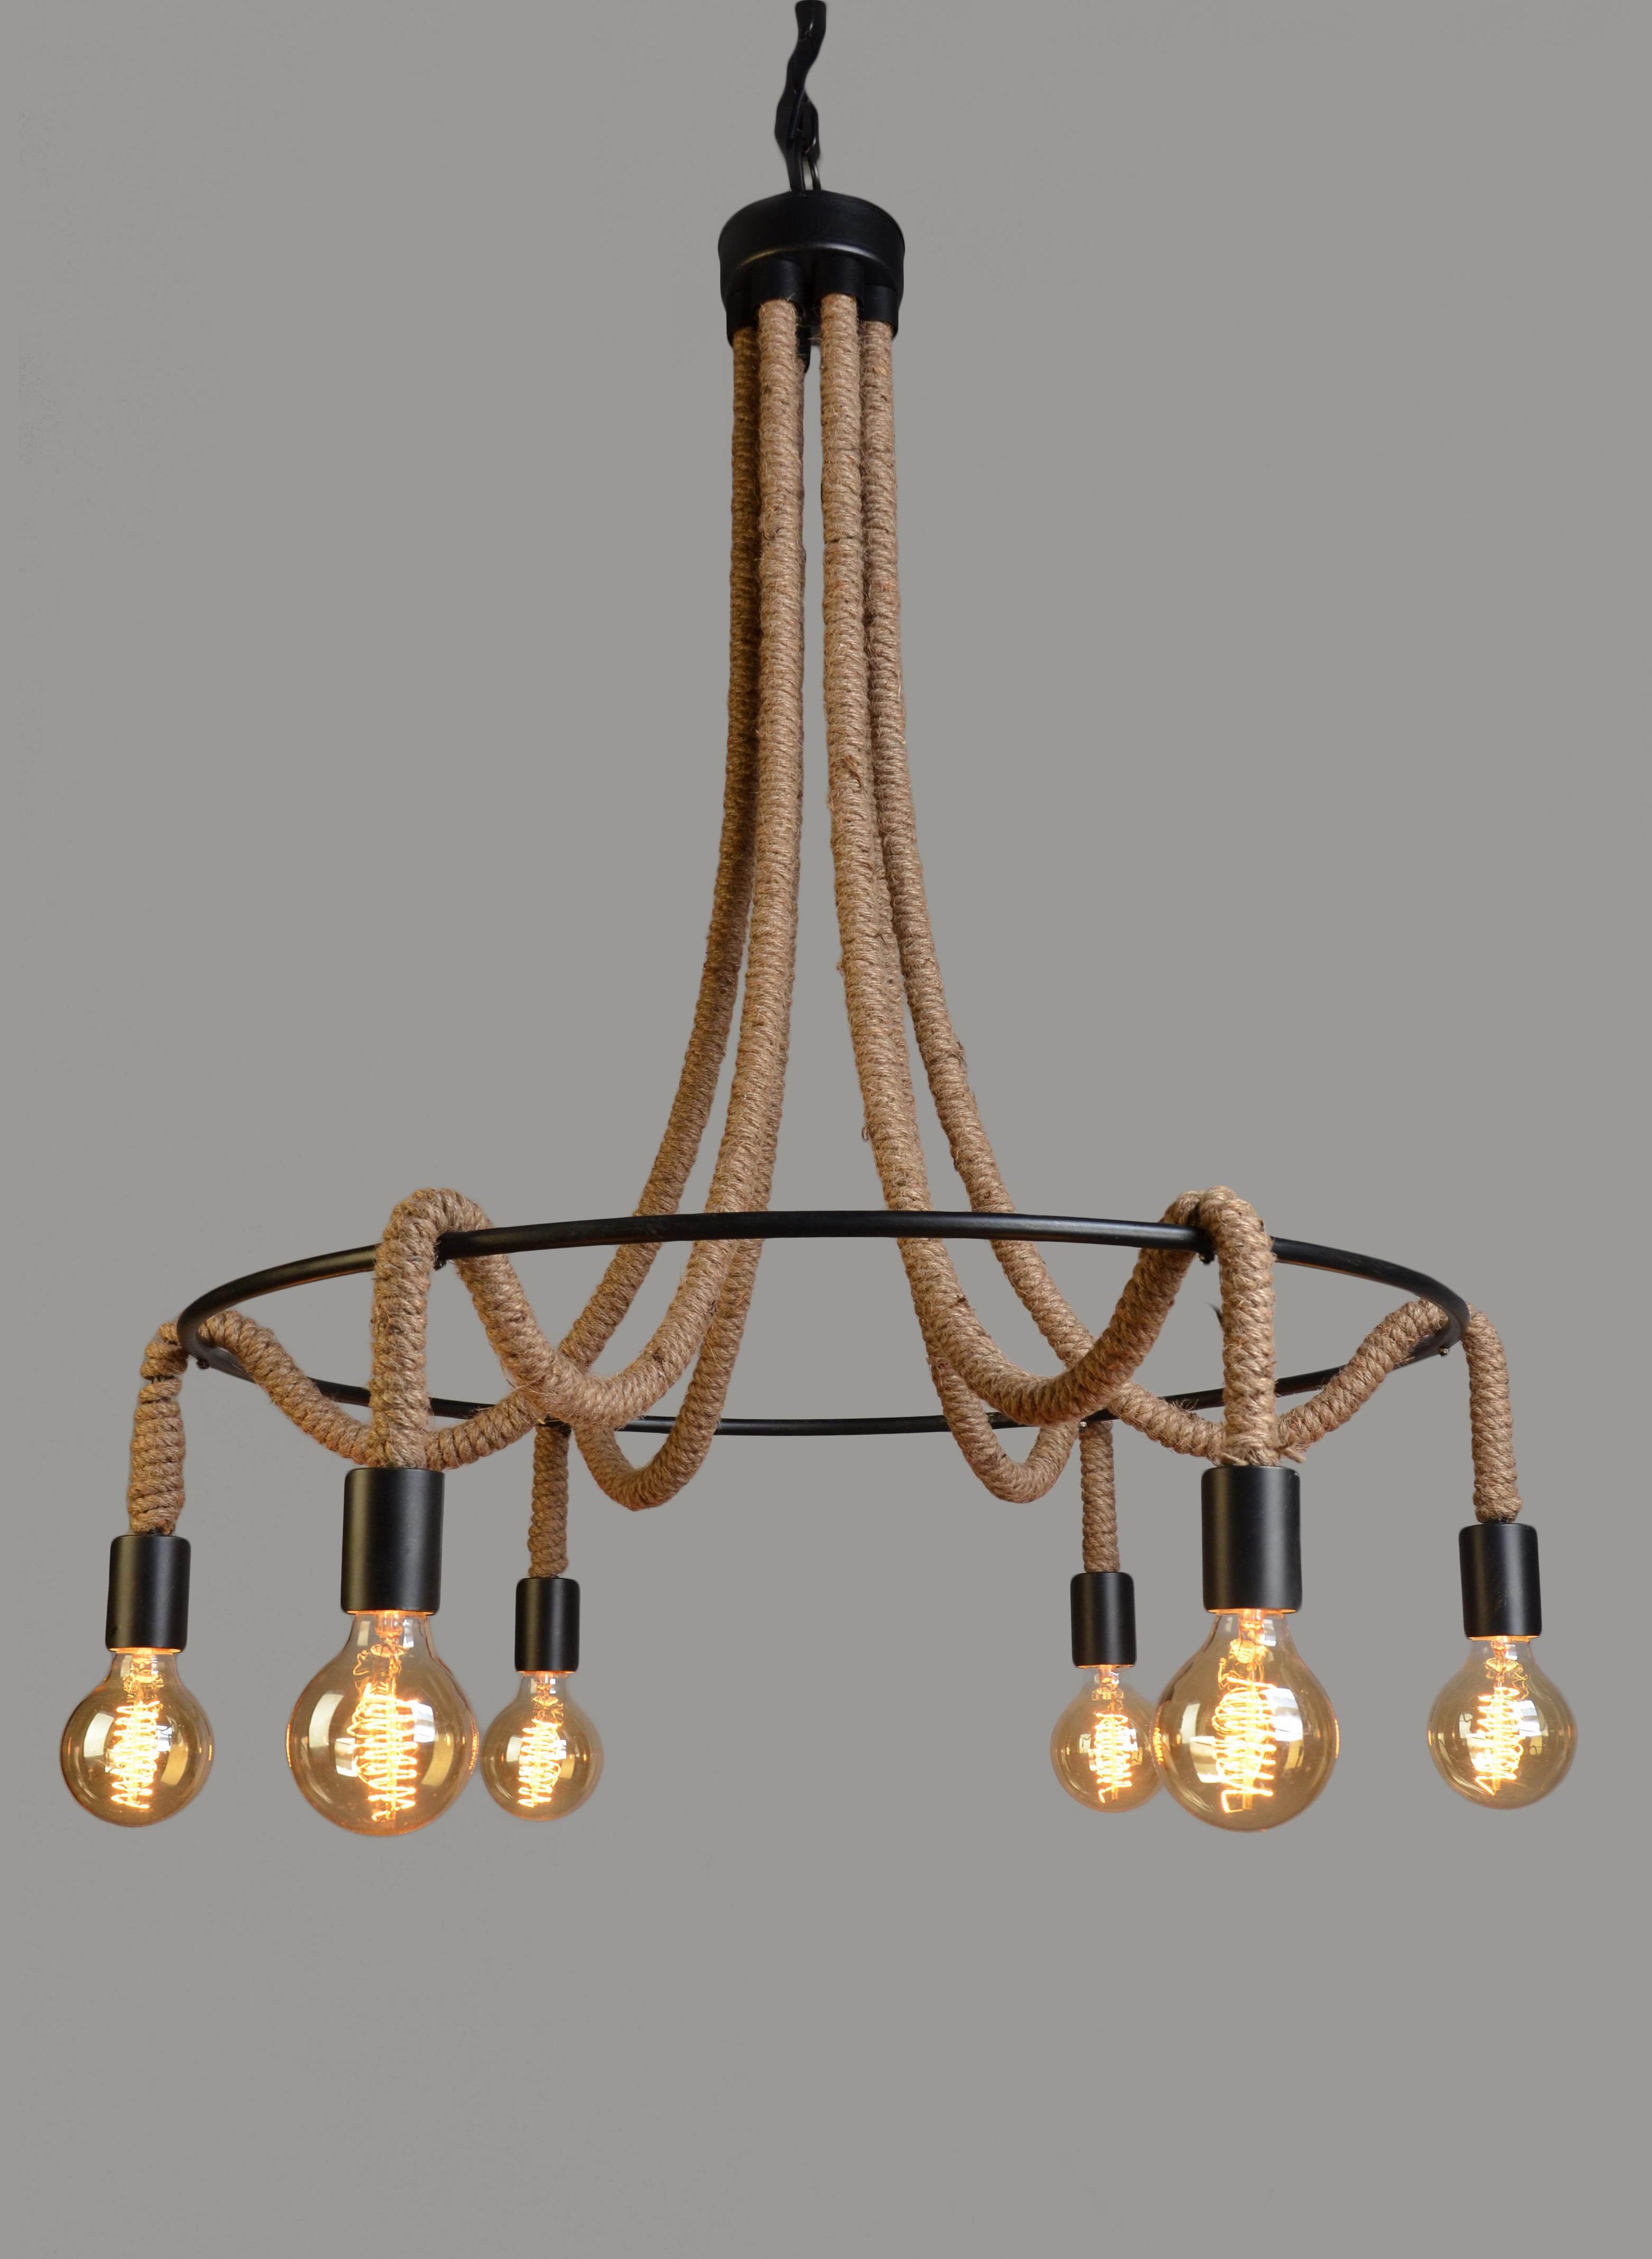 Goodrum 6 Light Wagon Wheel Chandelier With Regard To 2019 Millbrook 5 Light Shaded Chandeliers (Gallery 11 of 20)